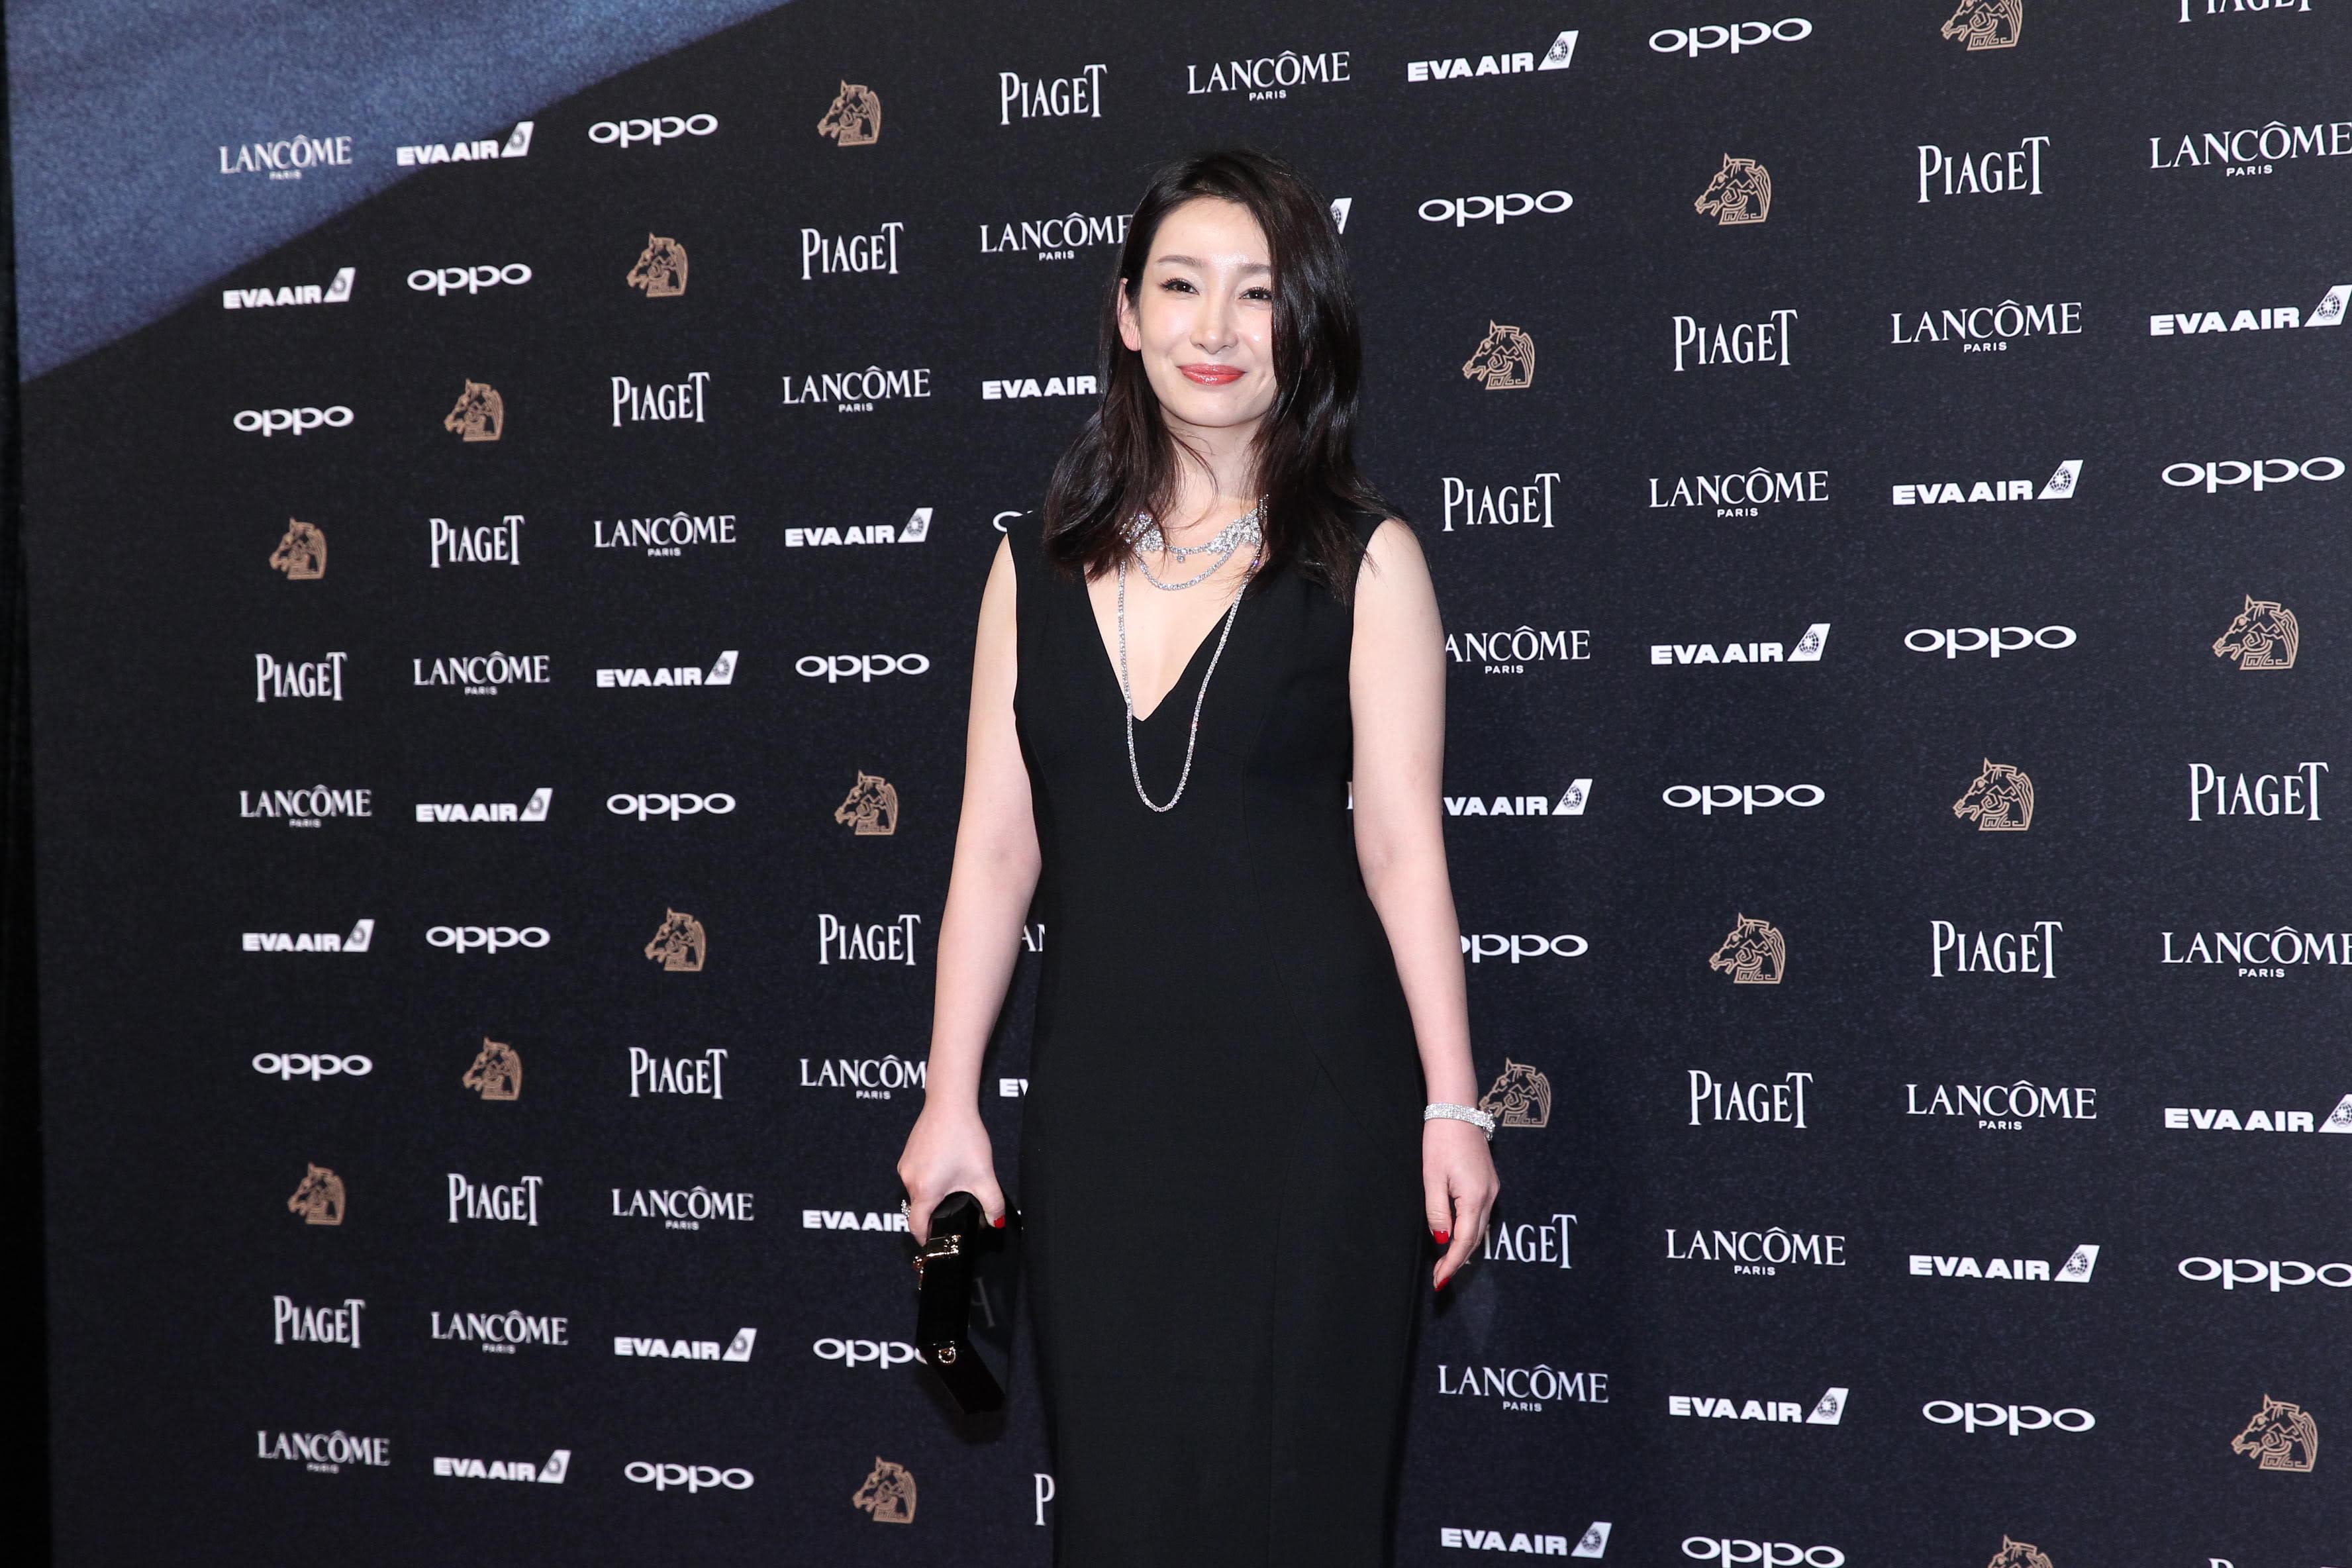 <p>曾同時獲得金馬獎最佳新演員及影后的秦海璐,這次擔任金馬獎評審(影像提供:達志影像) </p>